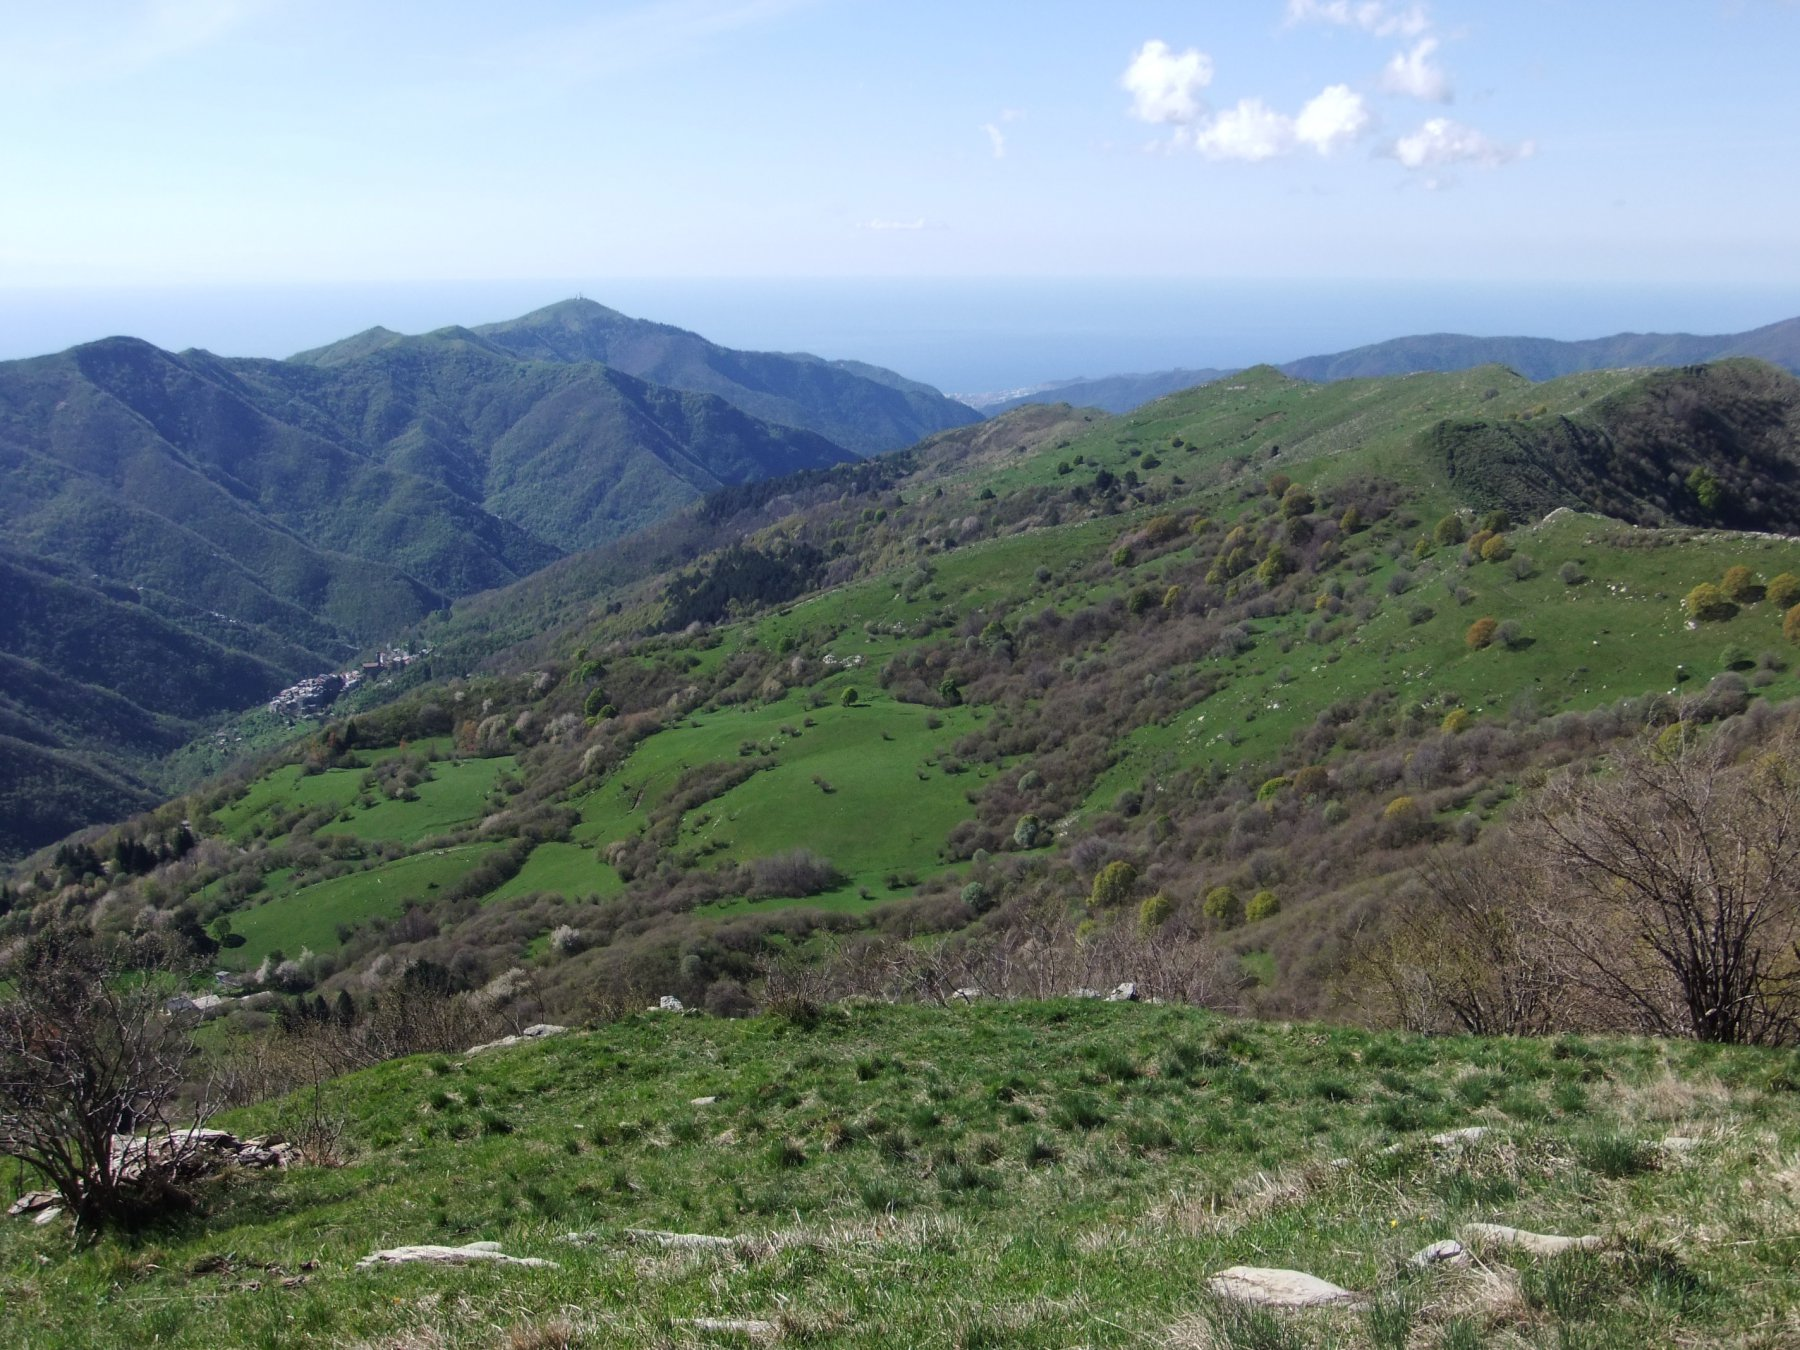 Prati Piani dal Monte Carpasina